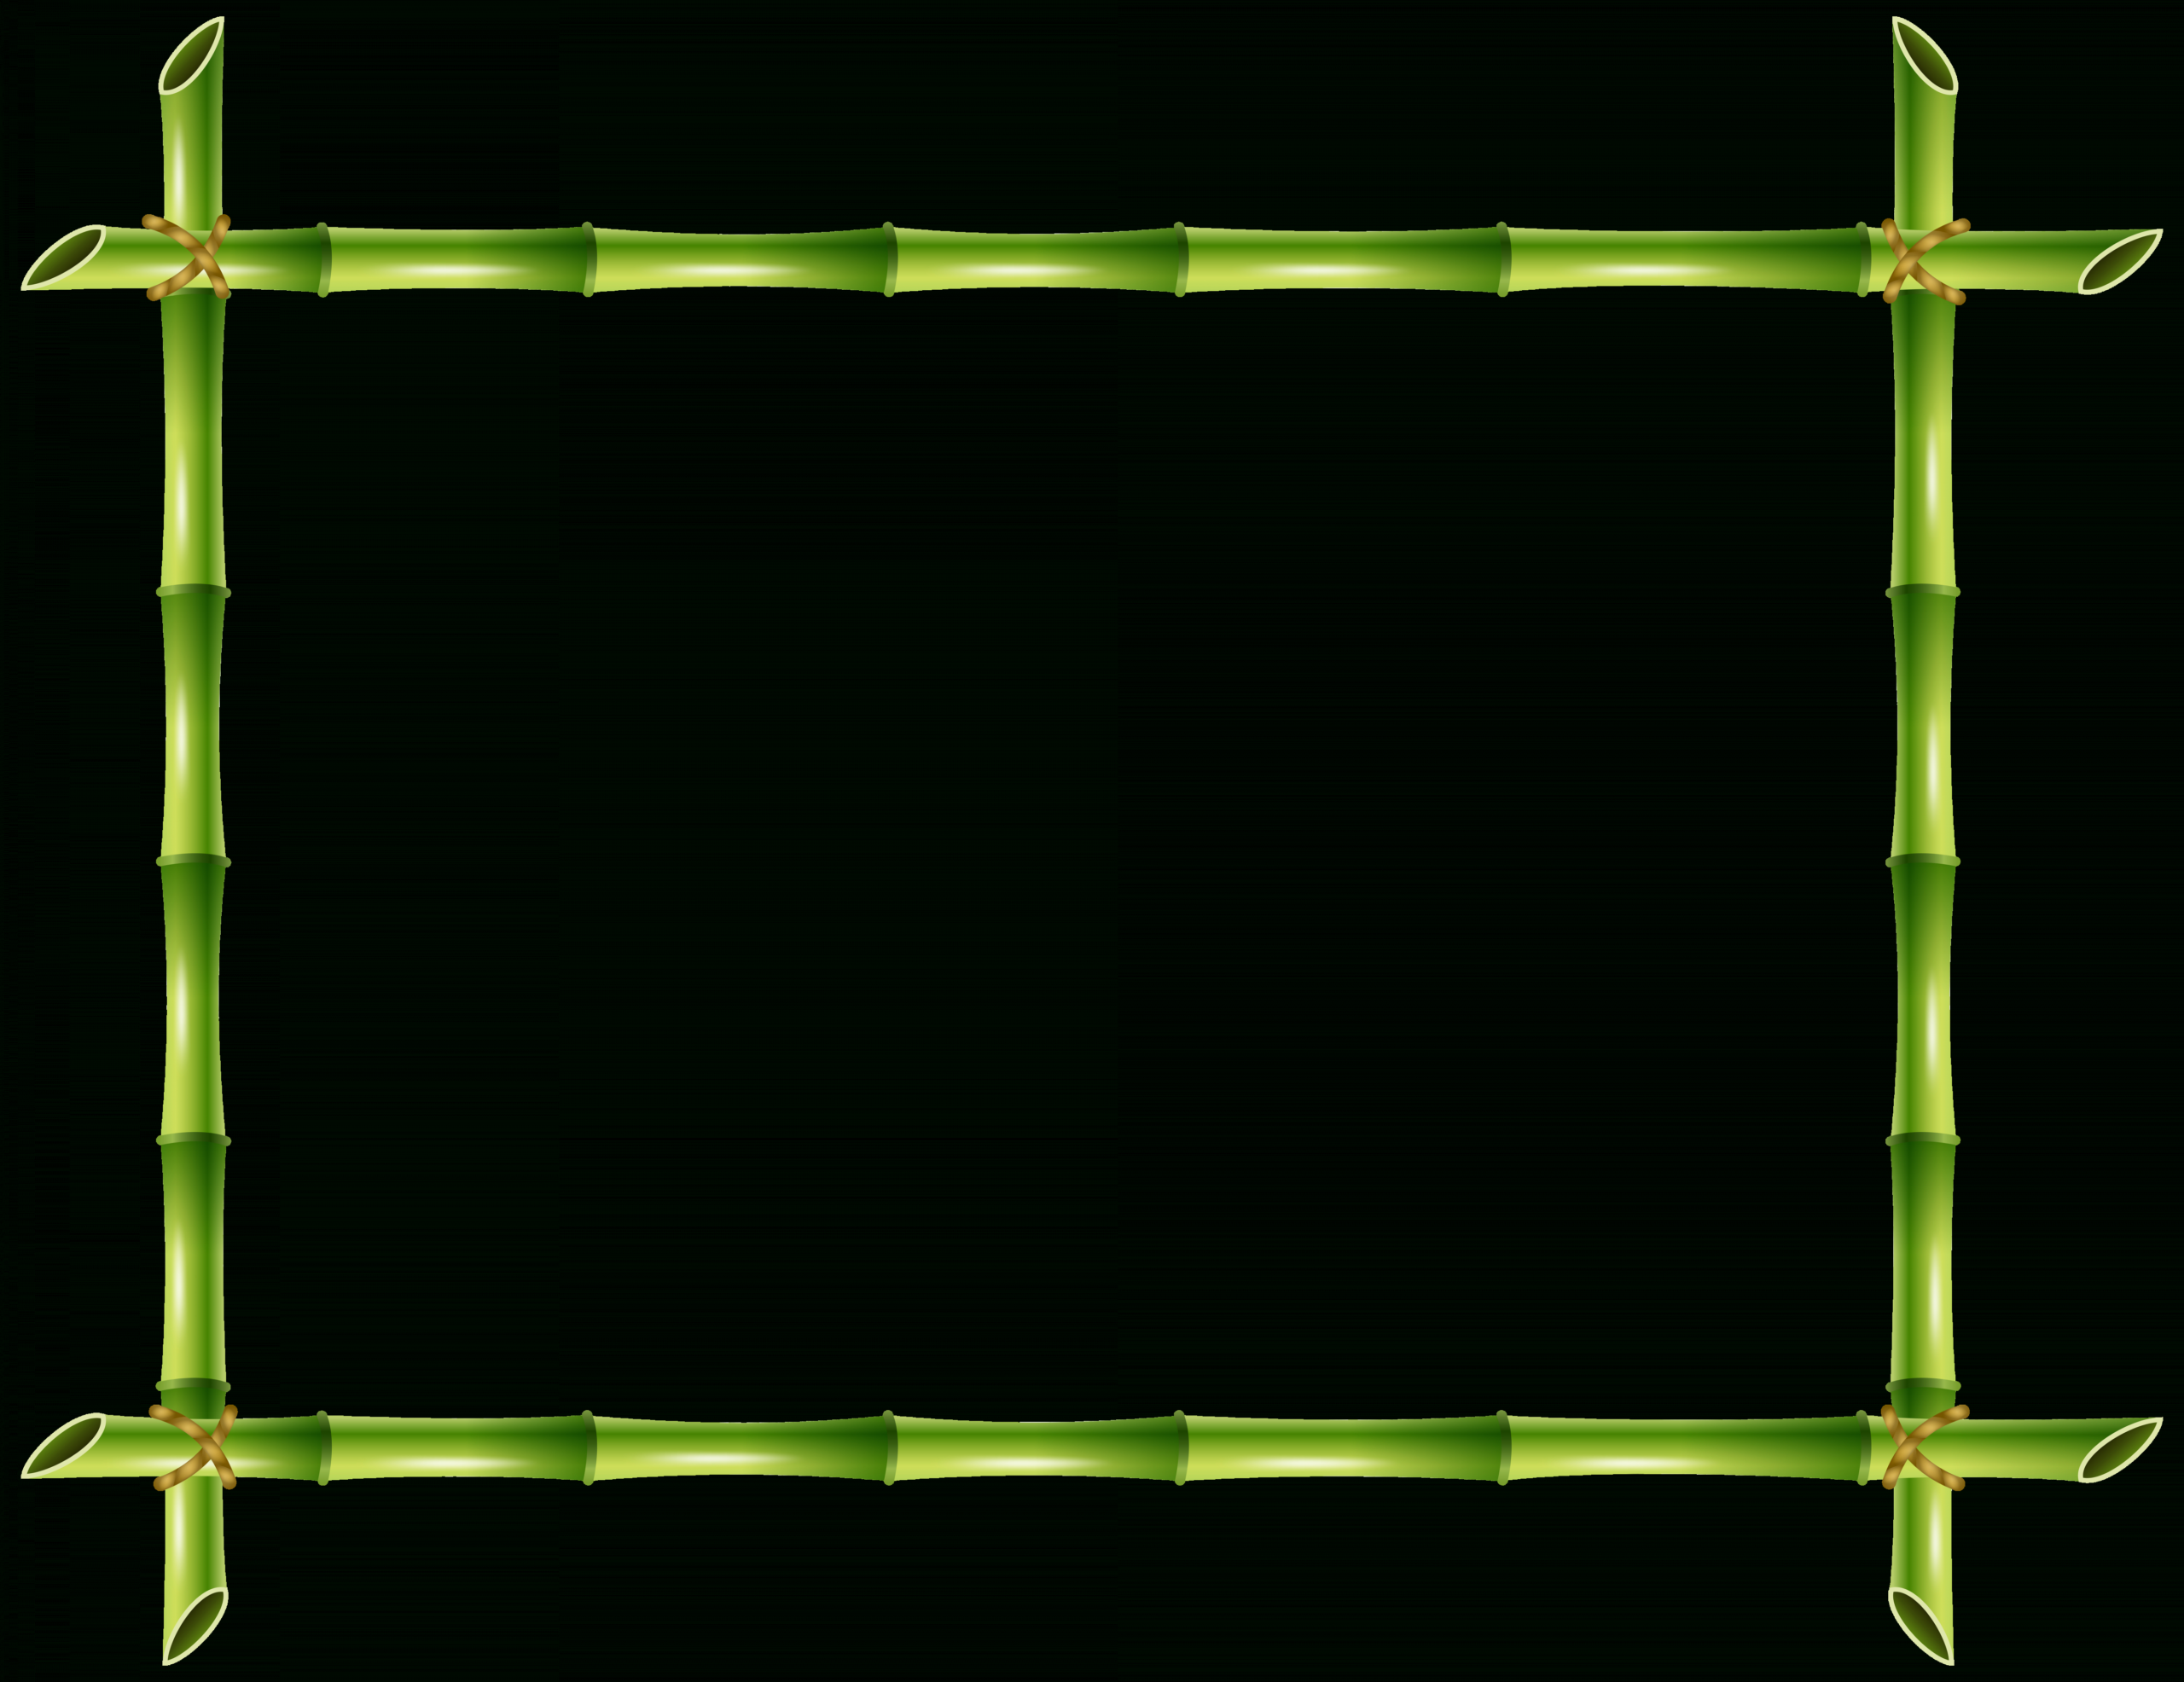 10 Bamboo Frame Png Bamboo Frame Frame Border Design Green Picture Frames